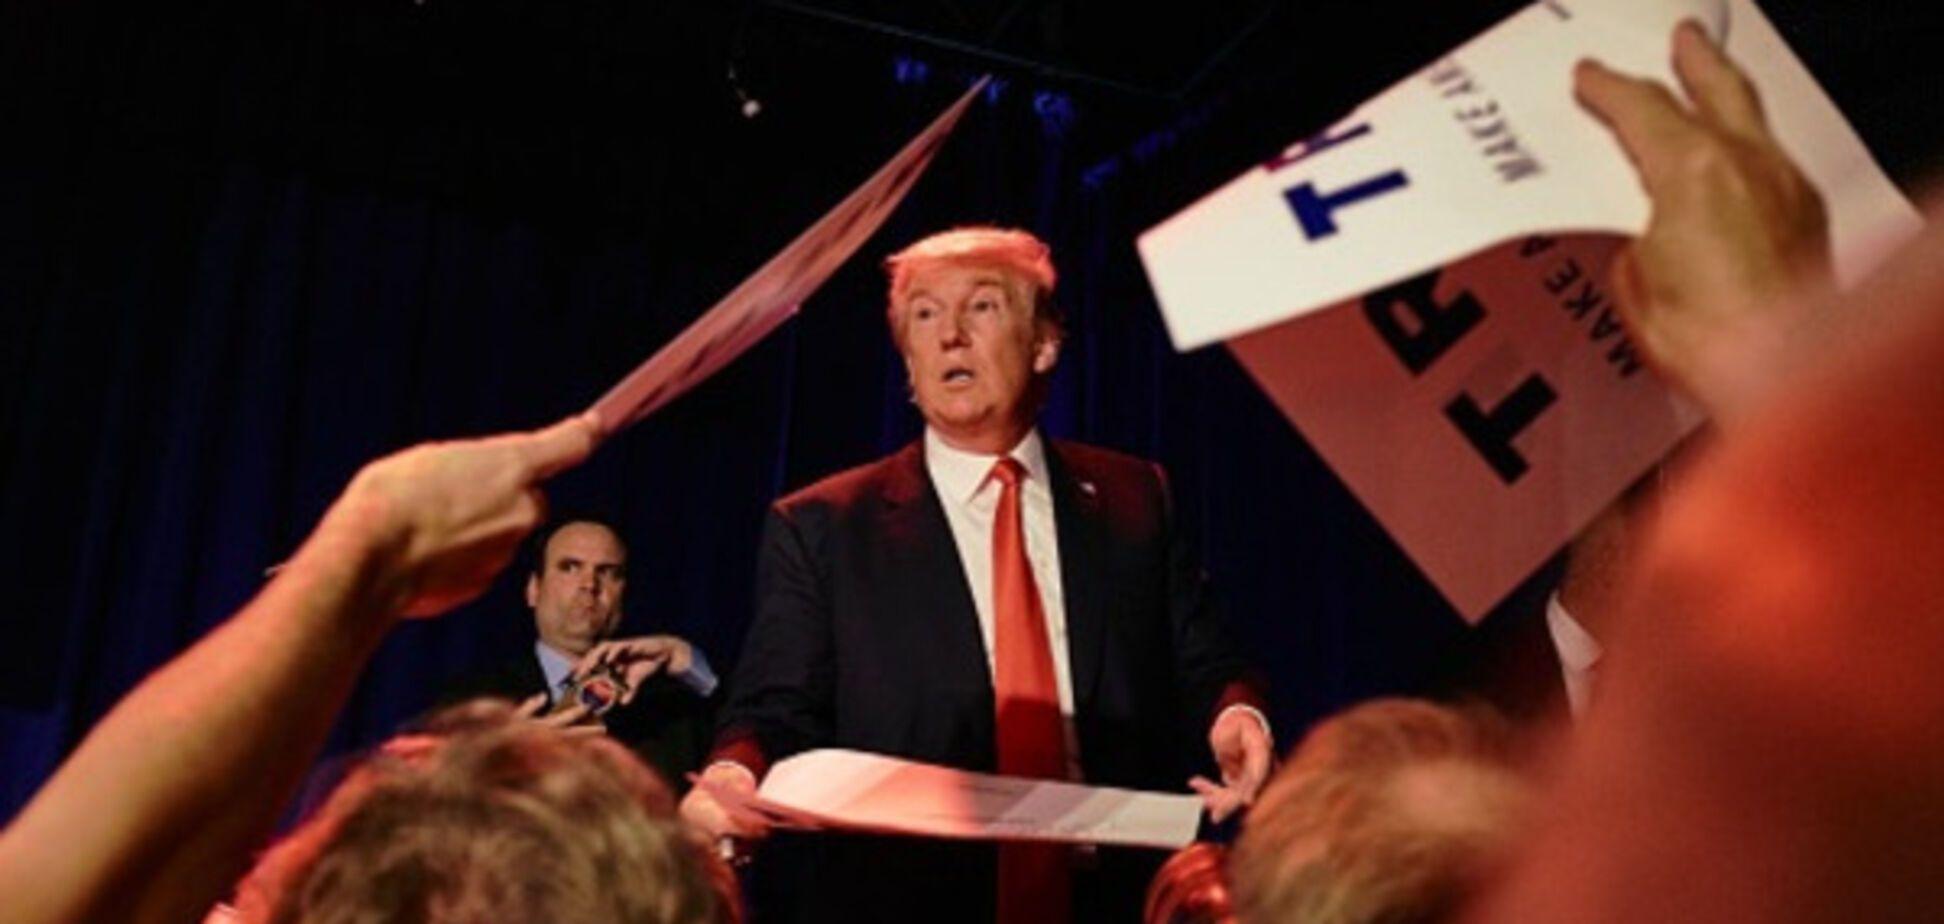 дональд трамп выборы сша